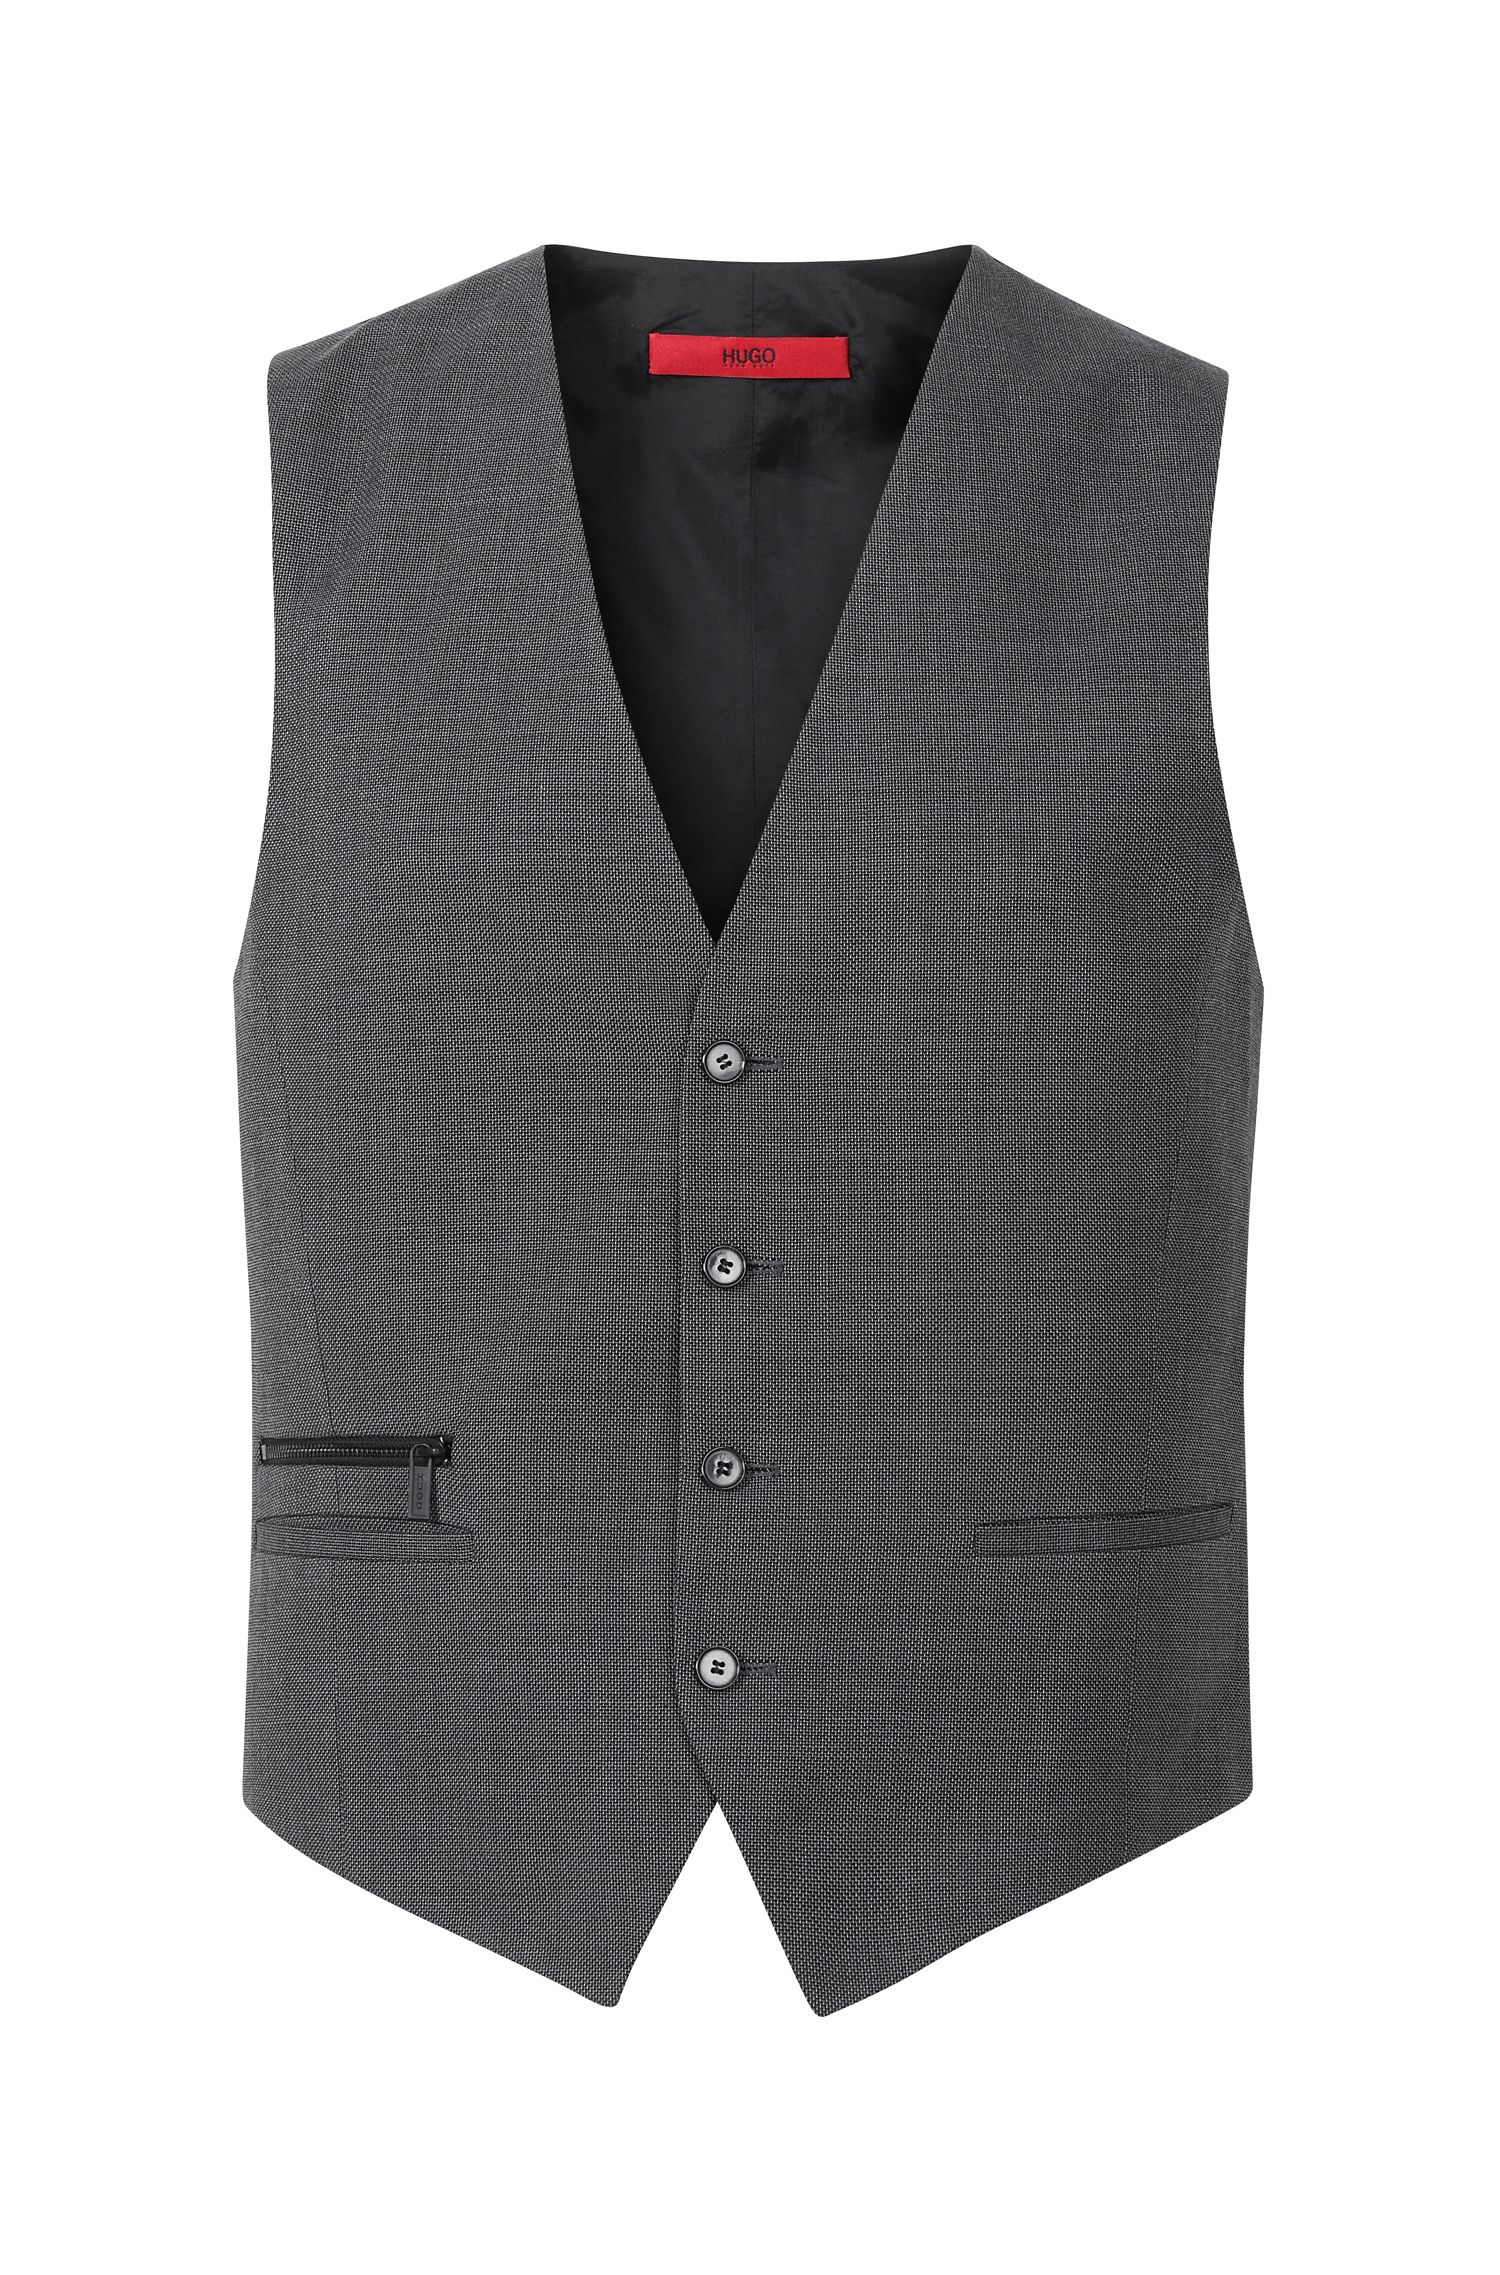 Virgin Wool Cotton Waistcoat, Slim Fit | Wadley